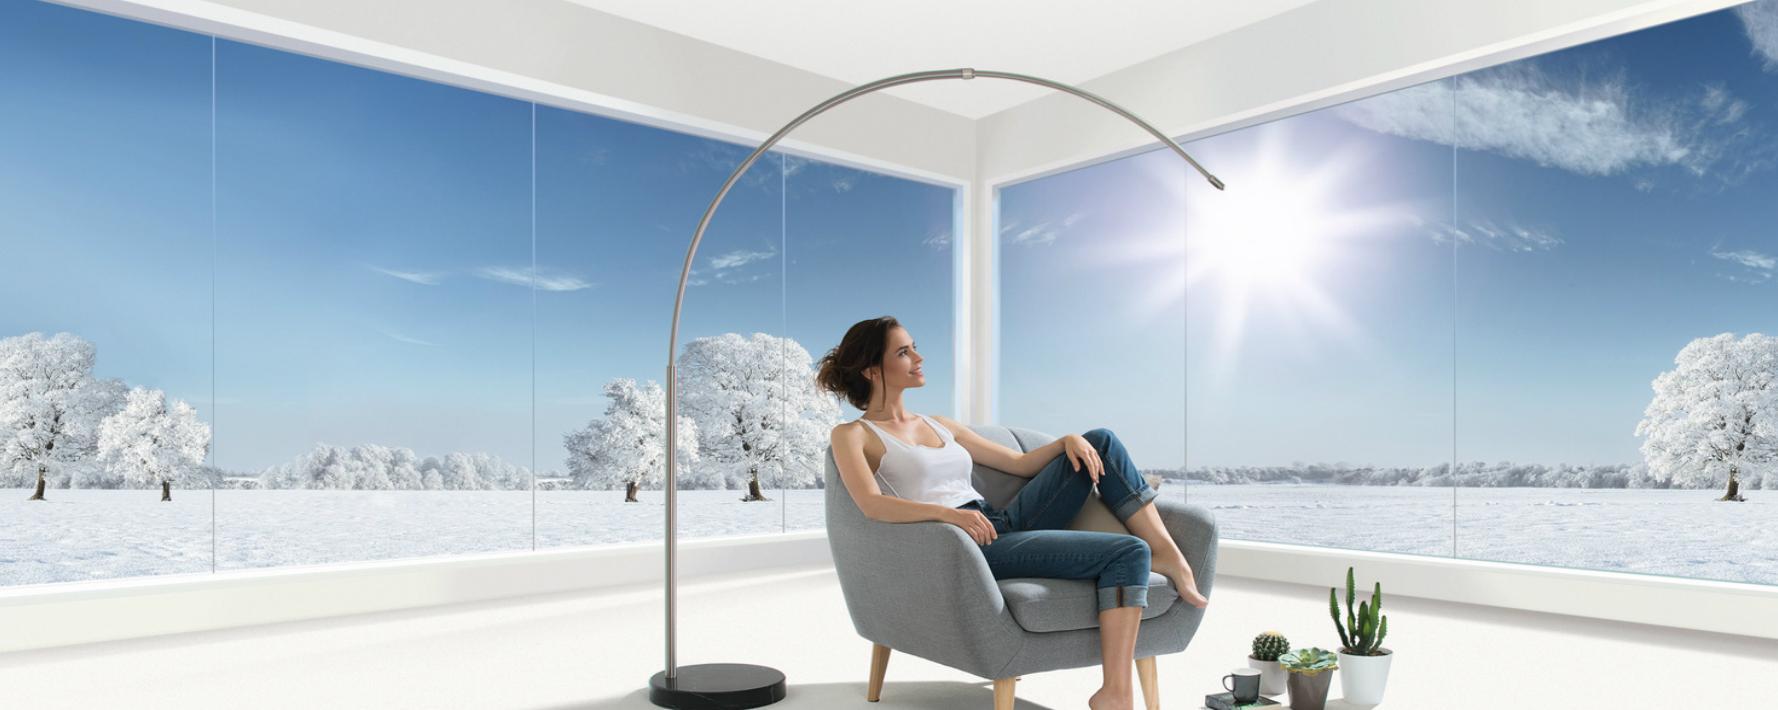 CLIMAPLUS ECLAZ ONE | Isolerend glas met hoge lichtinval | Saint-Gobain Building Glass